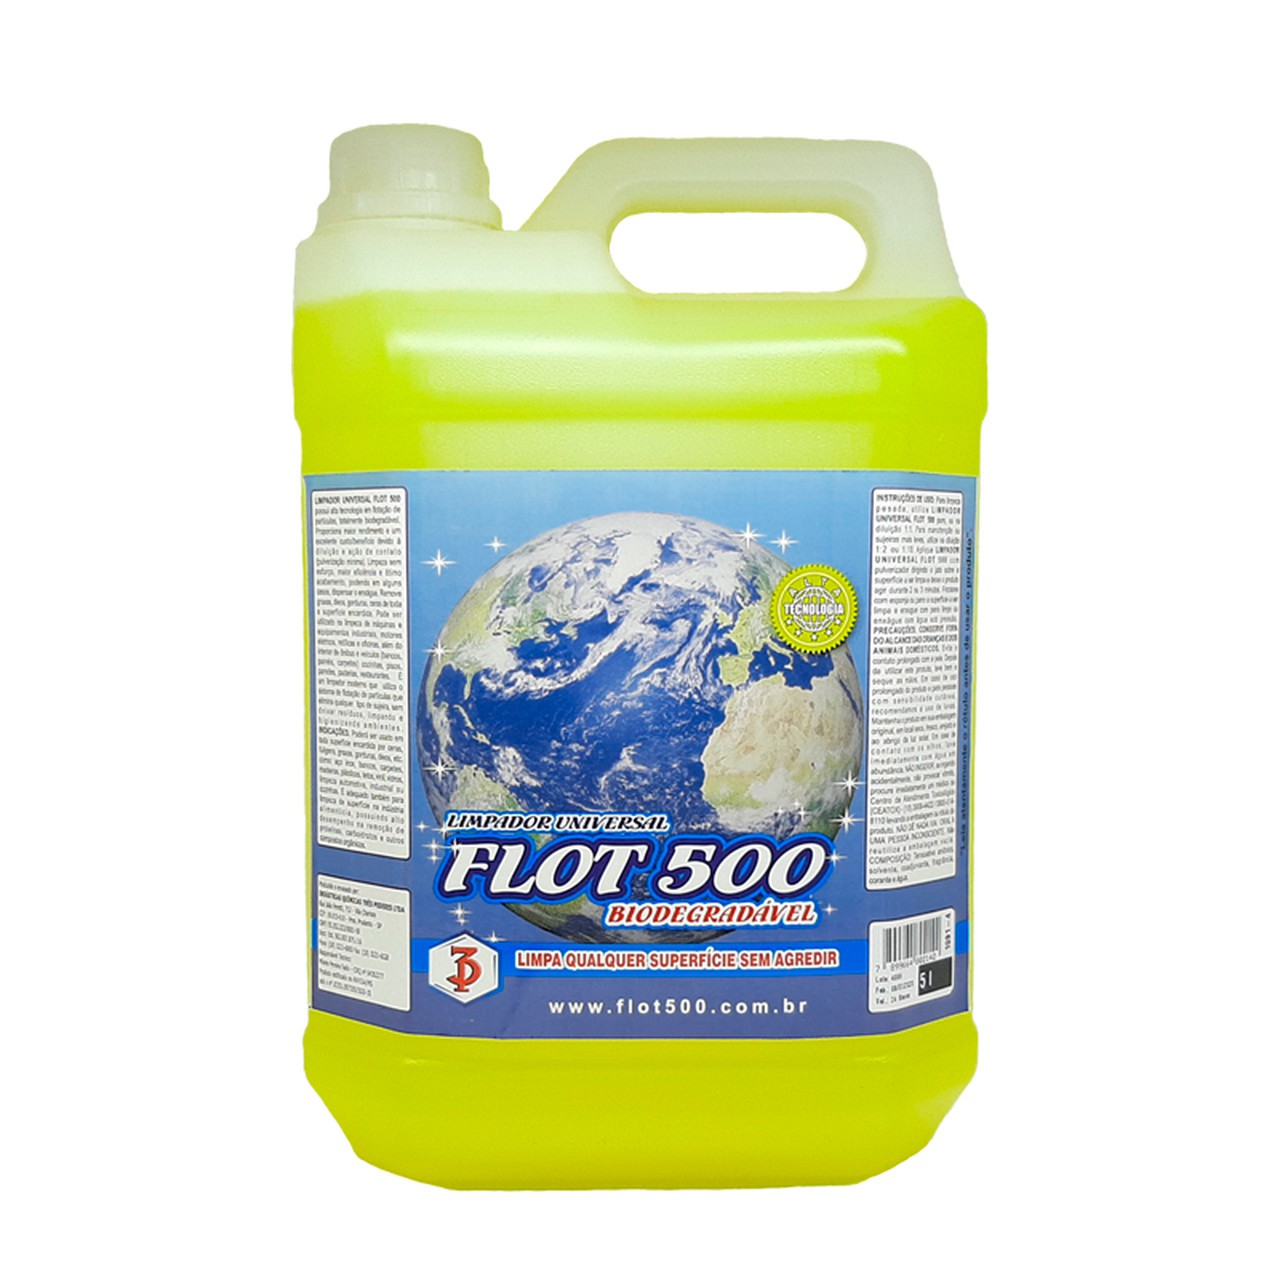 Limpador Universal Flot 500 3 Poderes 5LTS - Flotador Biodegradável